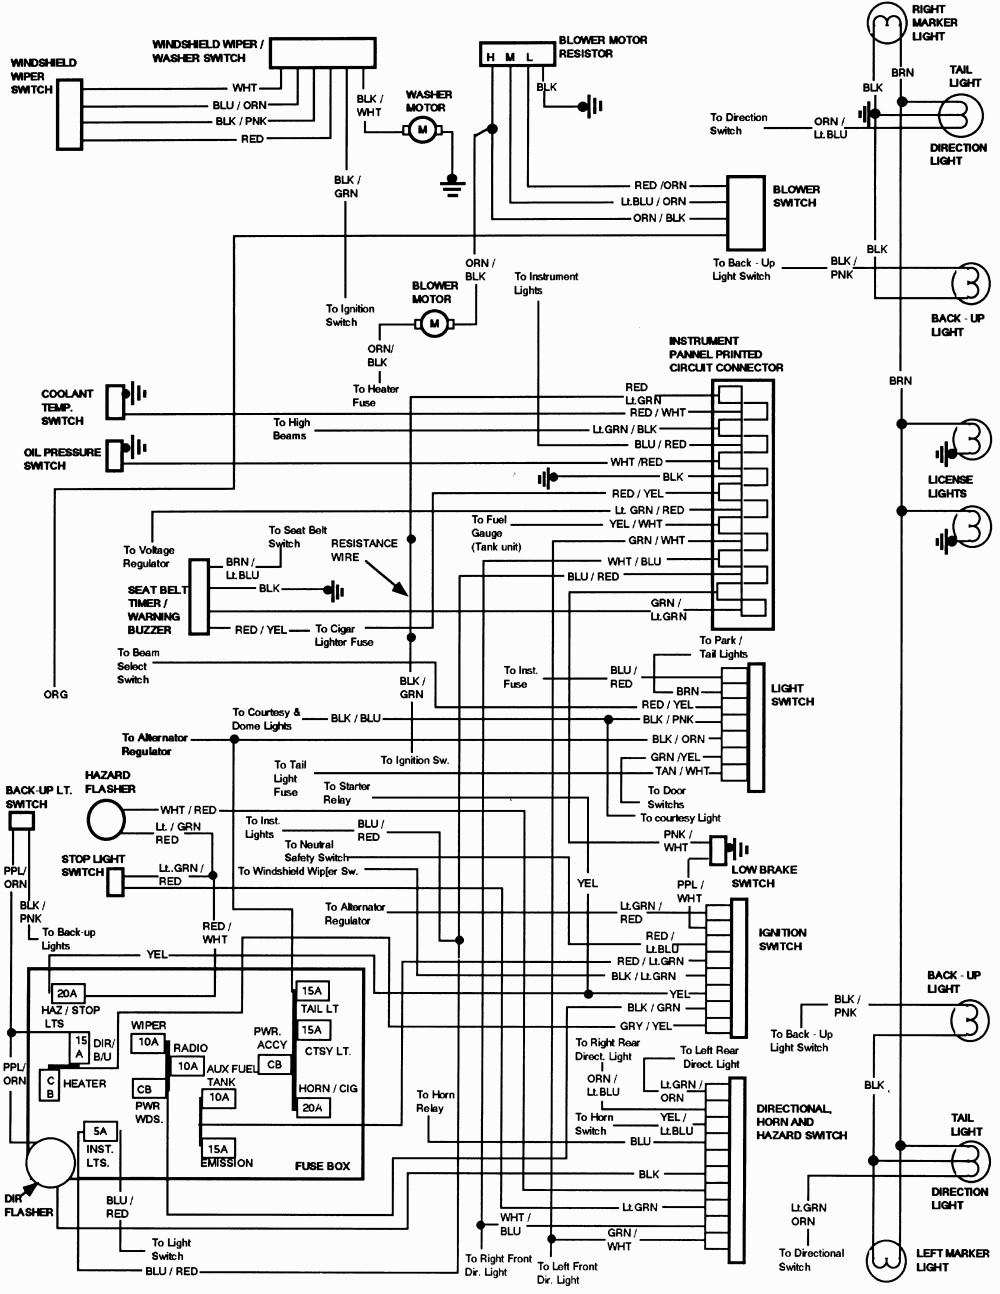 2005 ford stx f150 radio wiring diagram